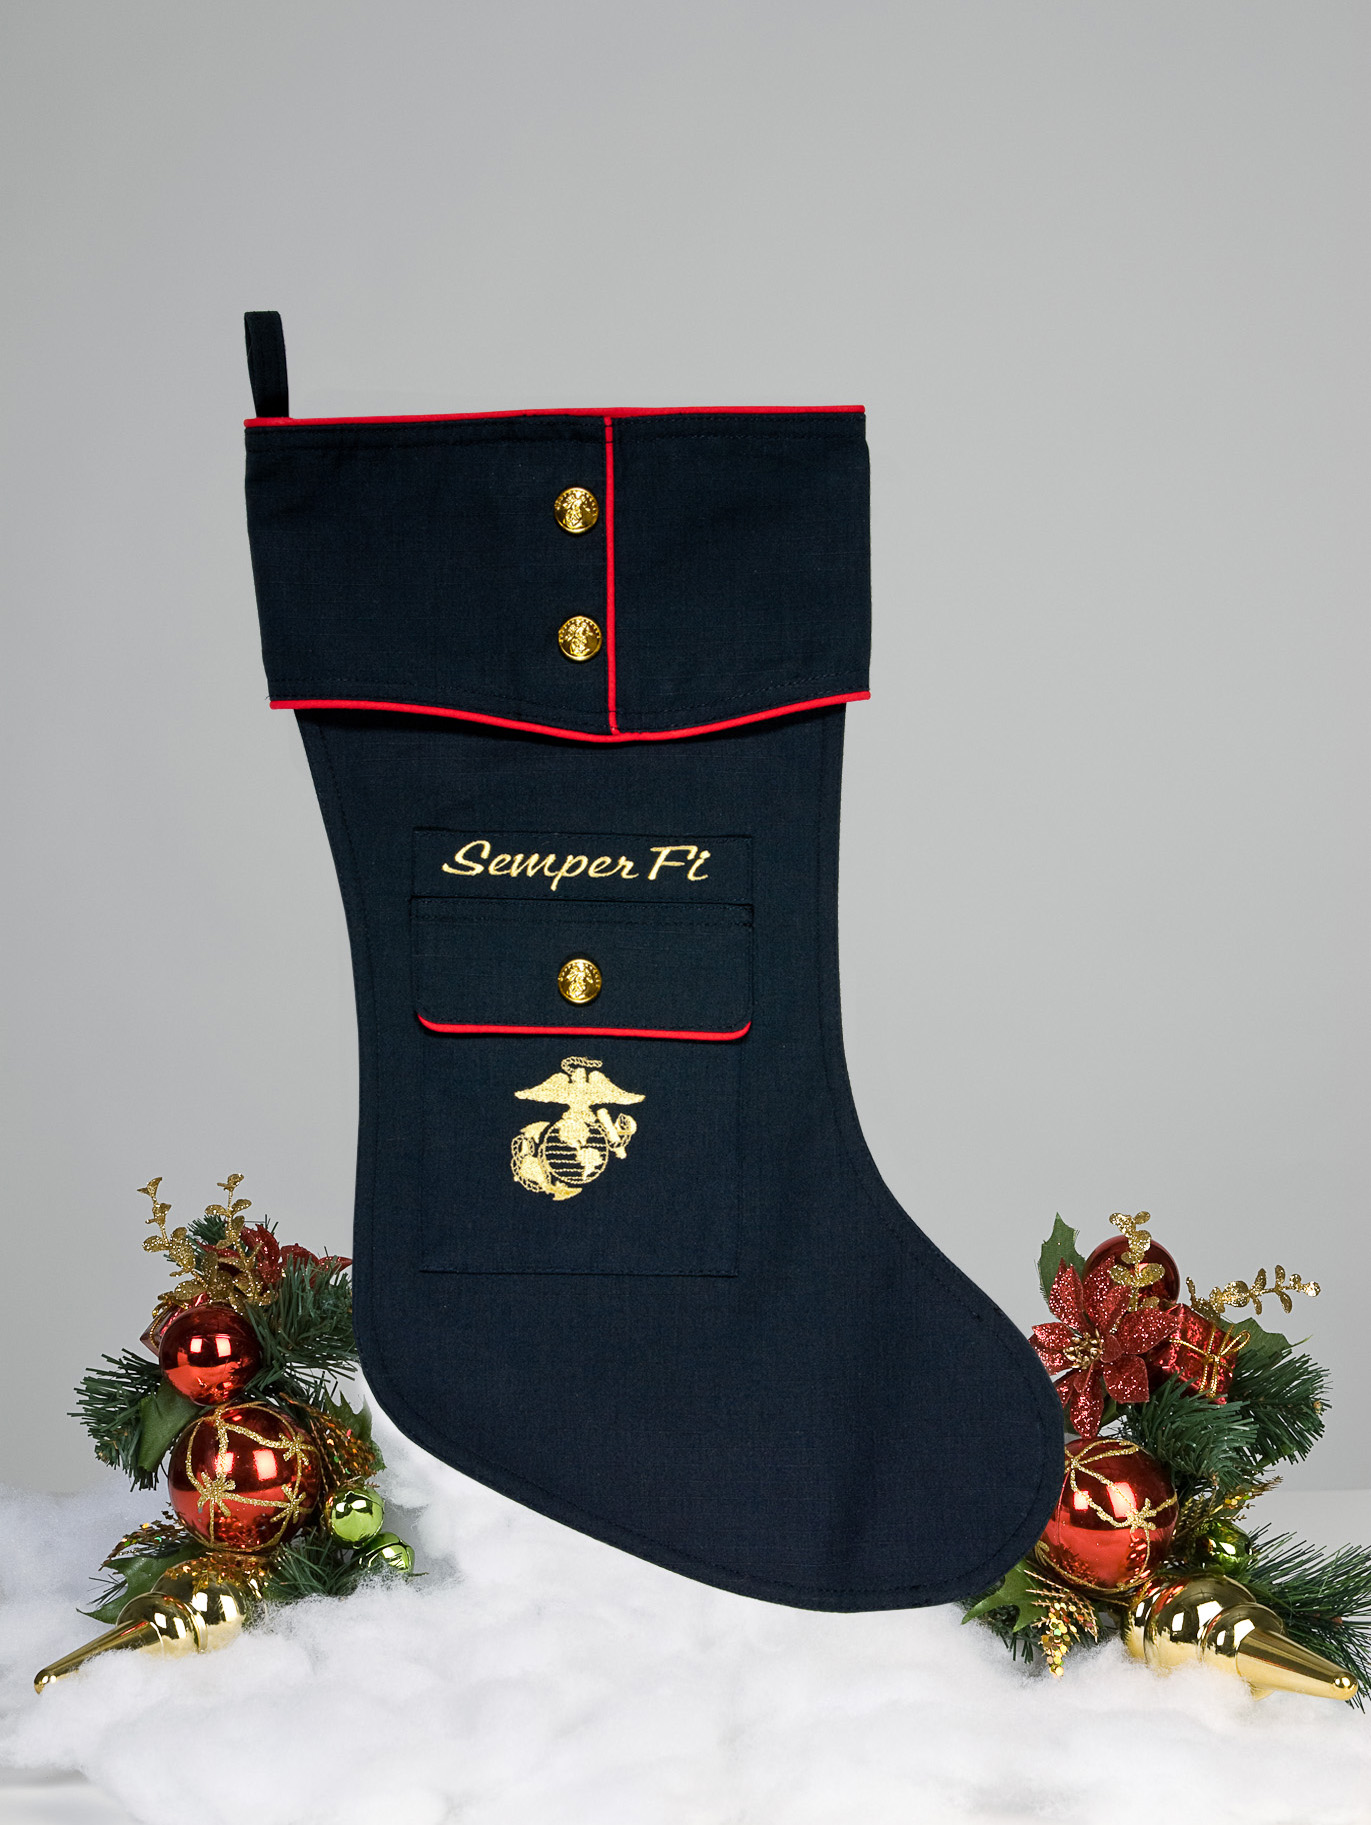 f5696a3ab63 U.S. Marine Dress Blue Christmas Stocking by Camosock - An elegant ...